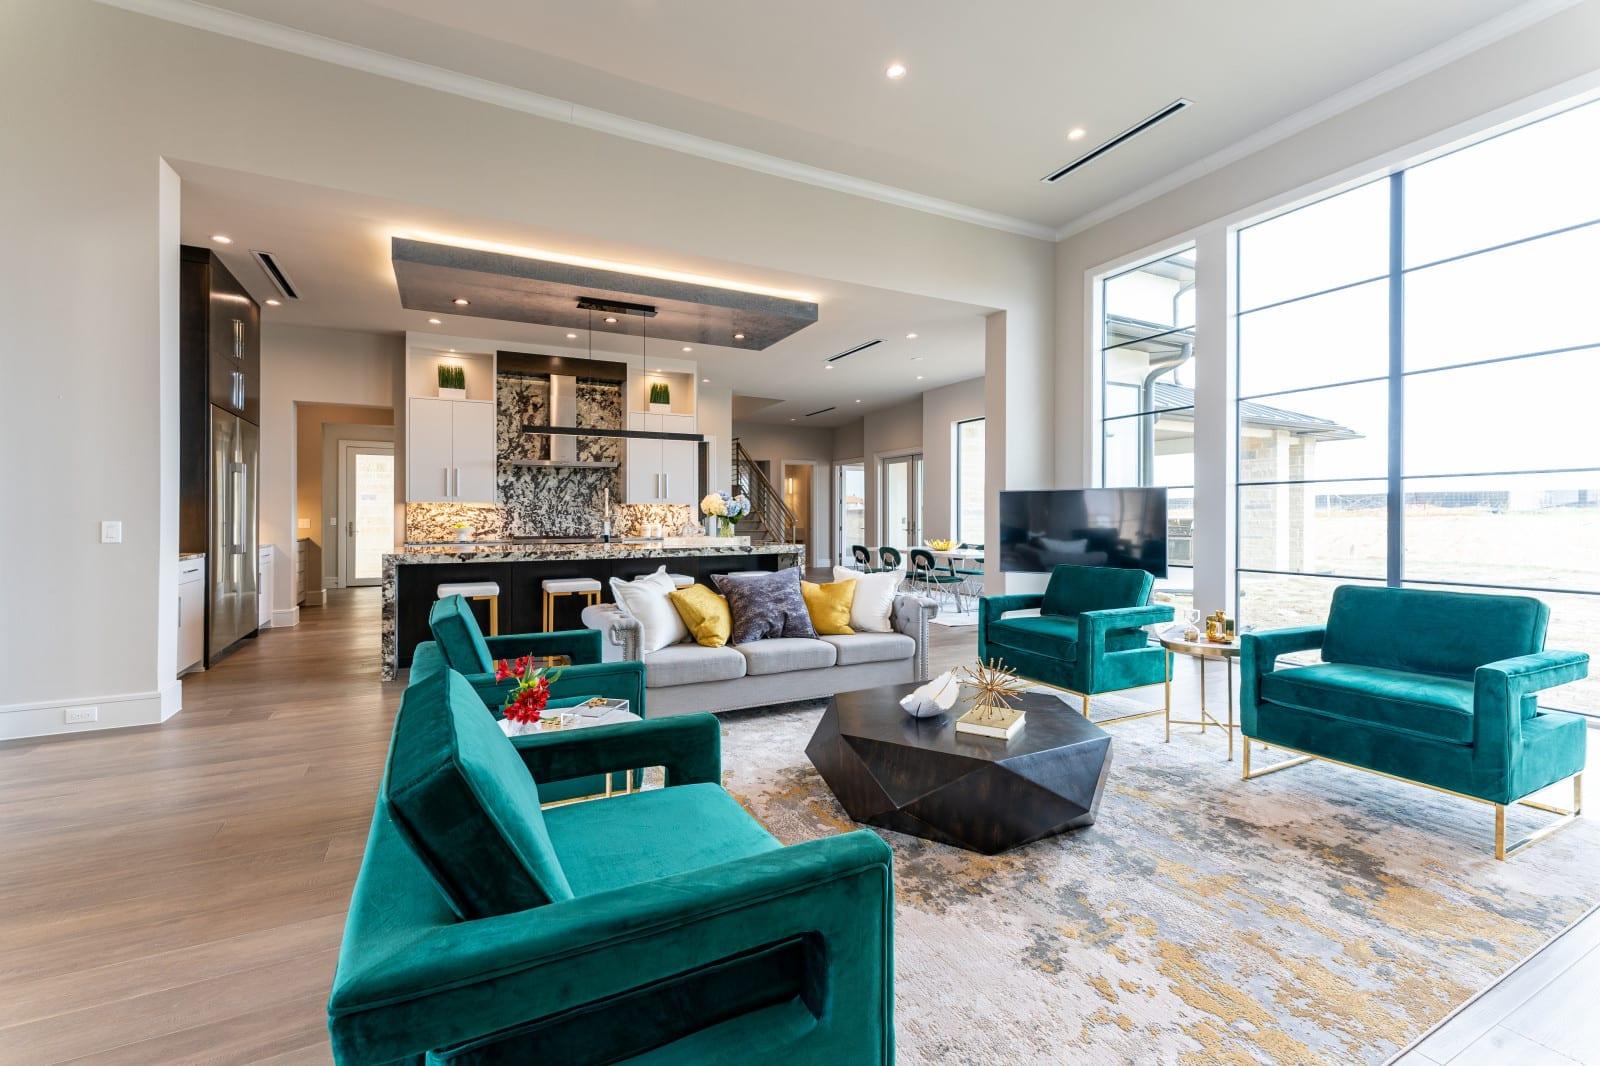 Modern Style Homes design # 40 - Millennial Design + Build